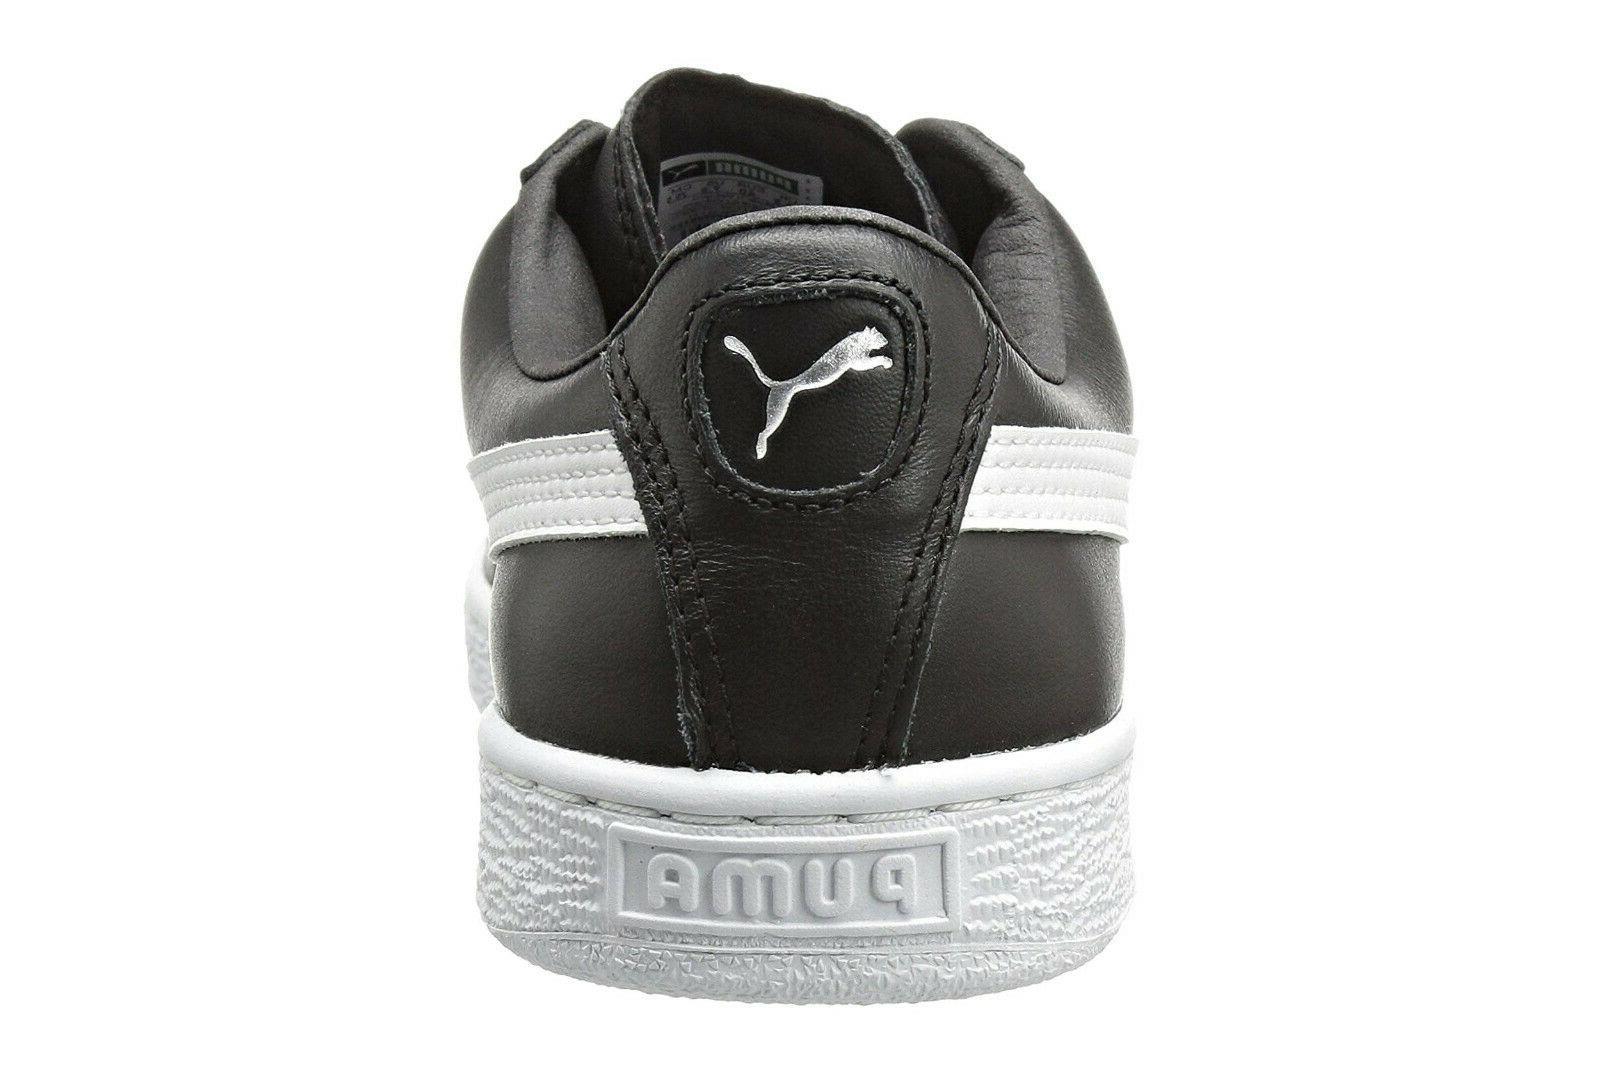 PUMA Basket Classic LFS Black White Sneakers Tennis Shoes Item 21